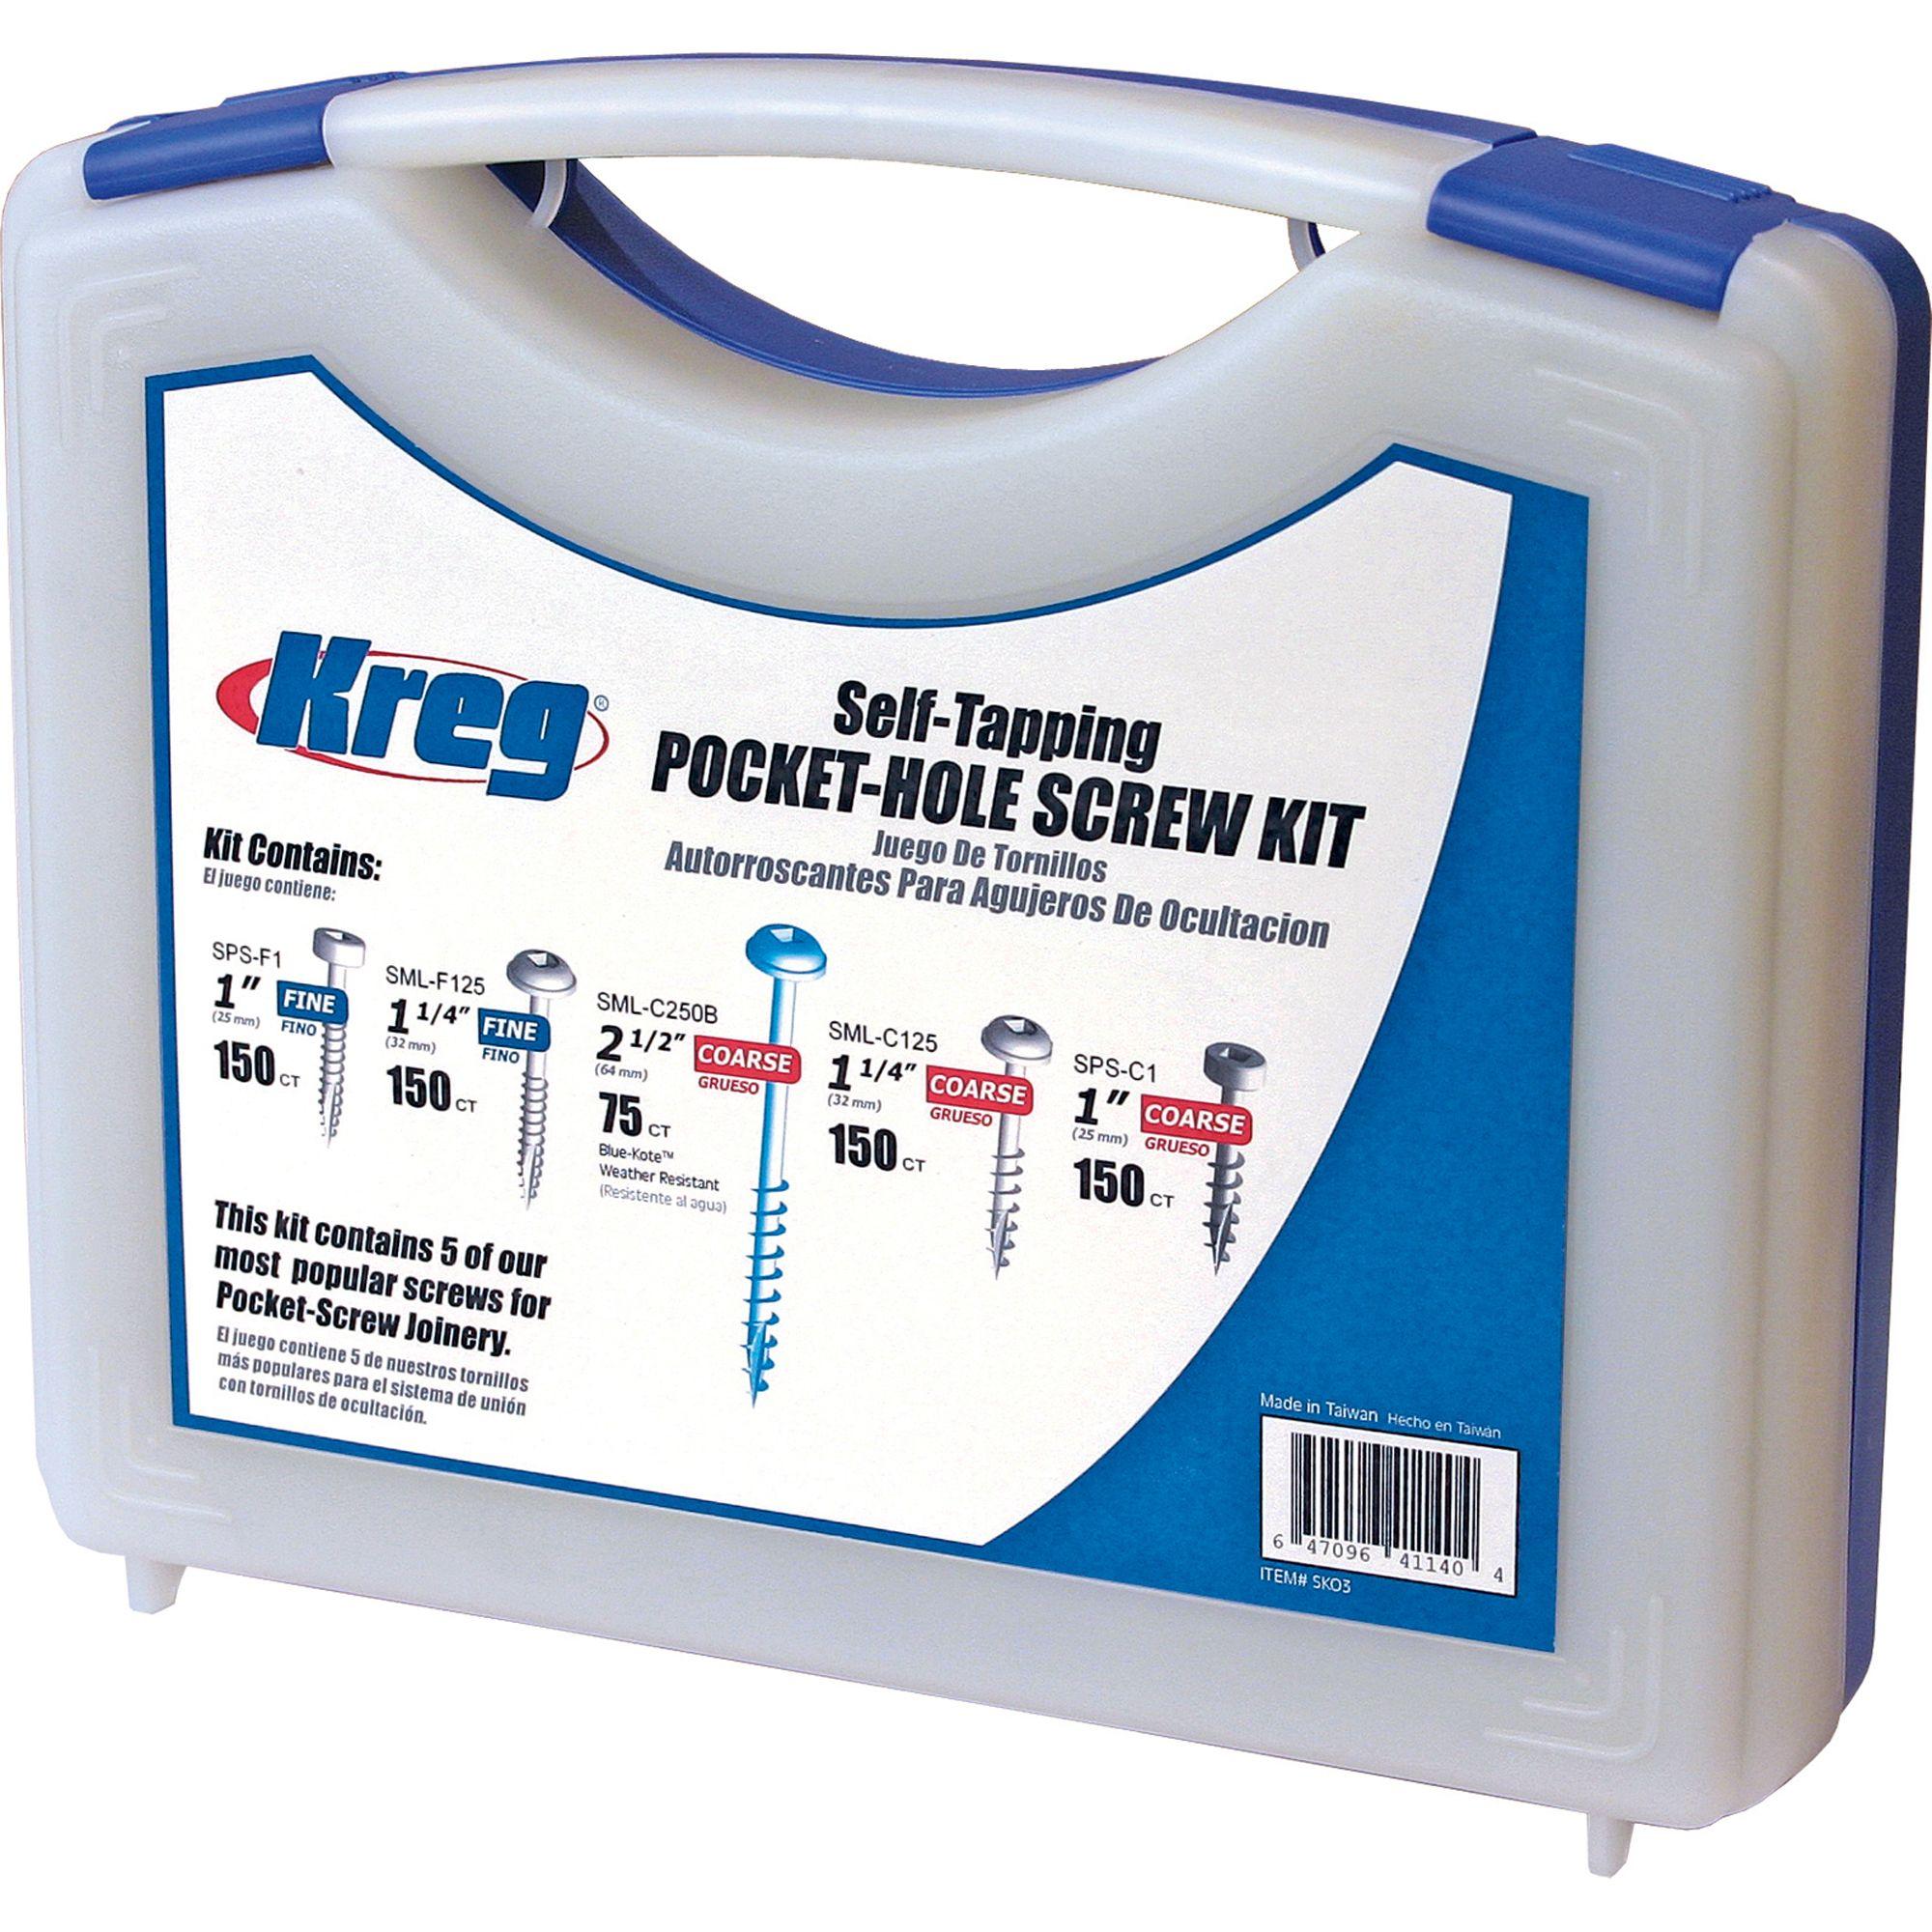 Kreg SK03 Pocket-Hole Screw Kit in 5 Sizes $23.52 at Amazon